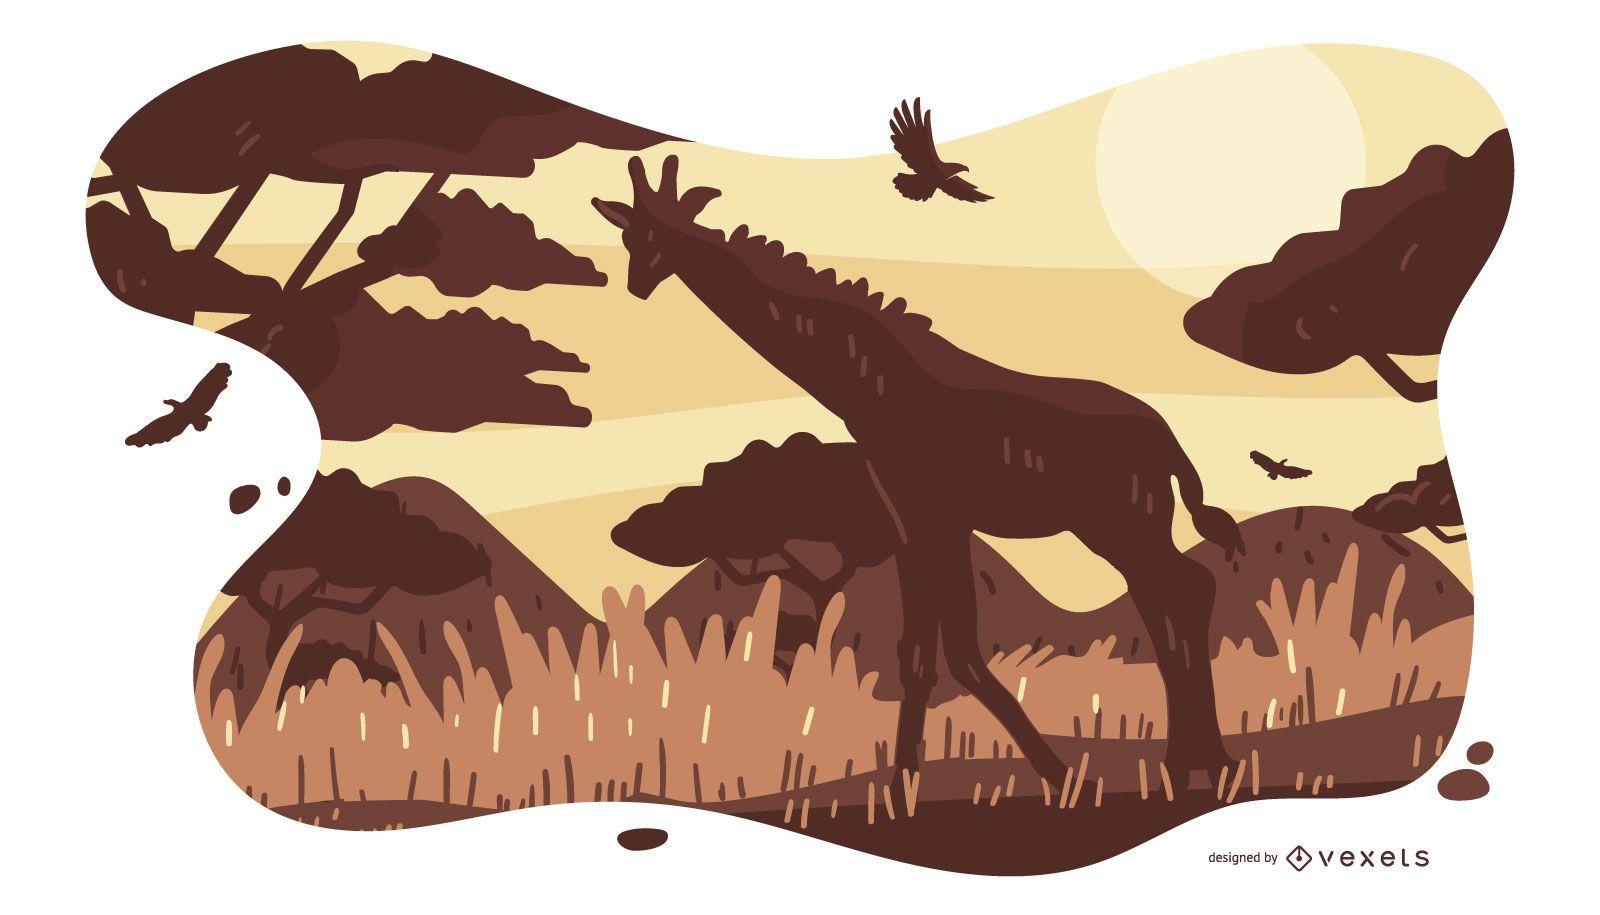 Safari Animal Africa Composição Design